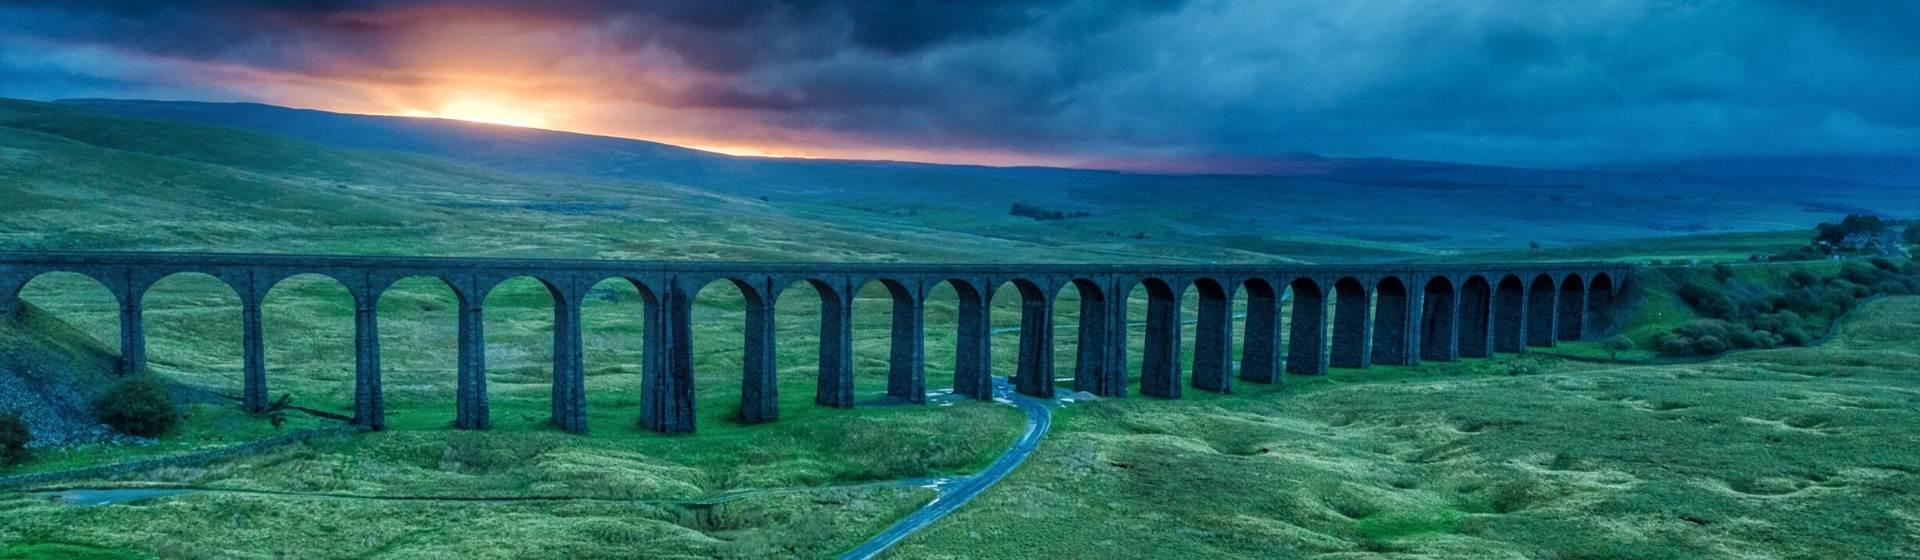 Carlisle - Settle Railway & the Lake District